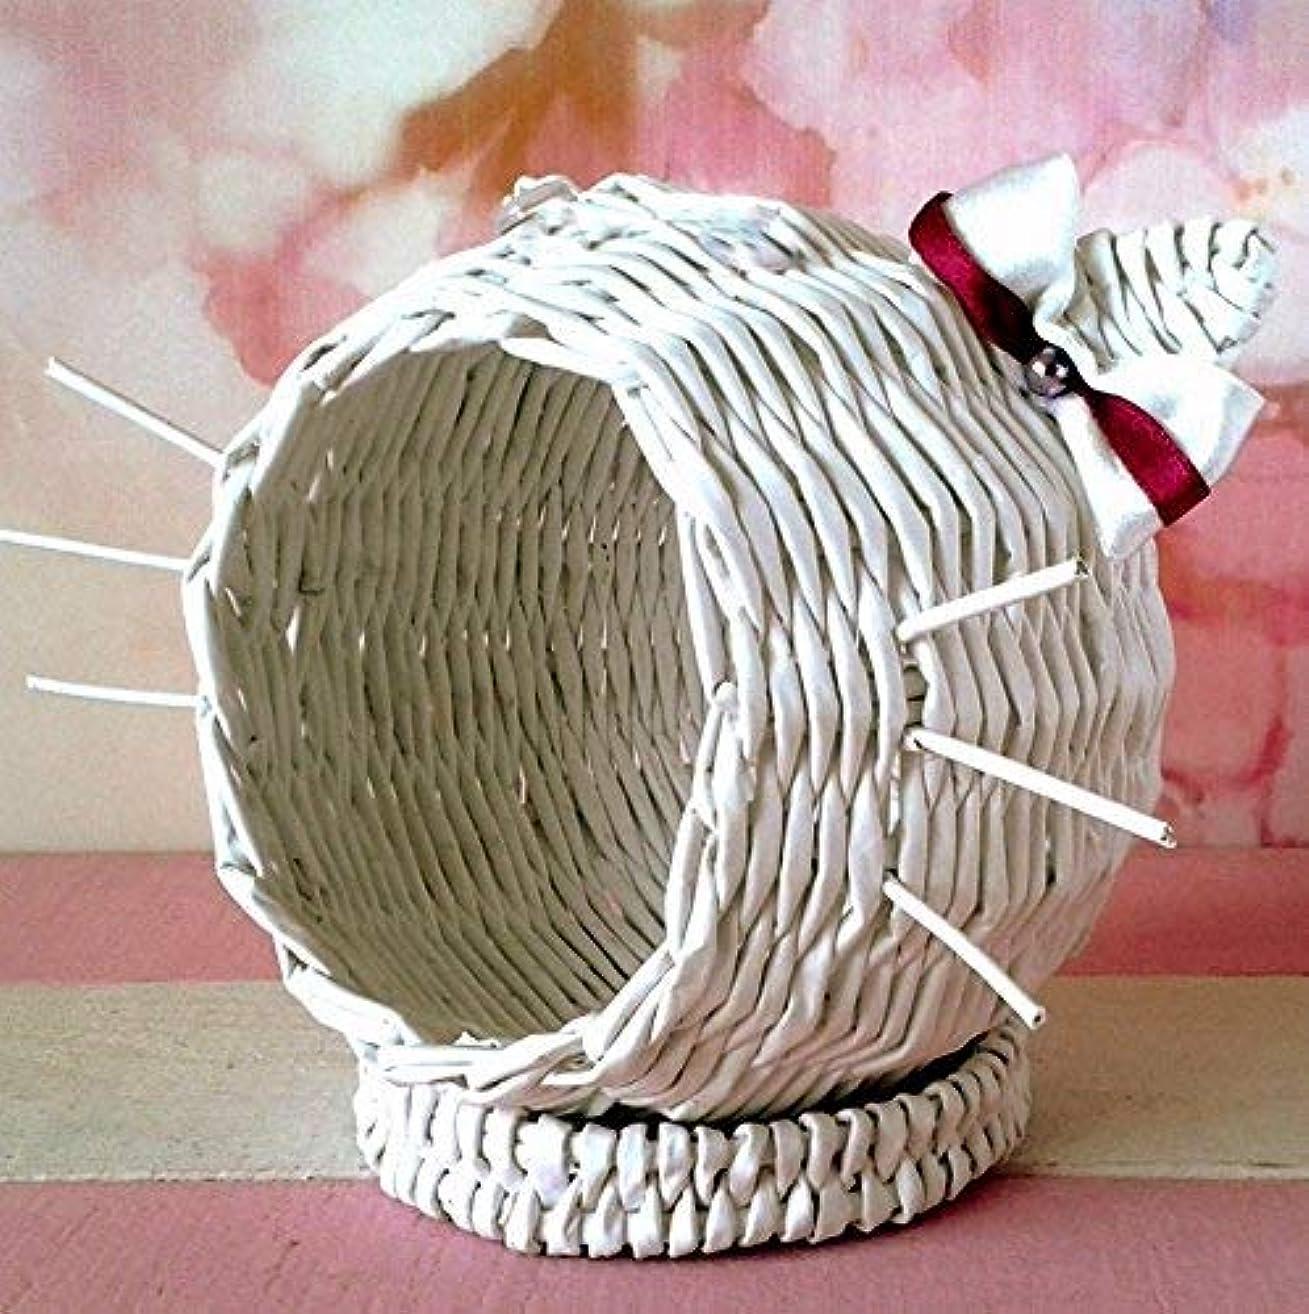 Pet bed for dollhouse, decorative wicker storage basket. White cat box rattan look weave nest hideout.